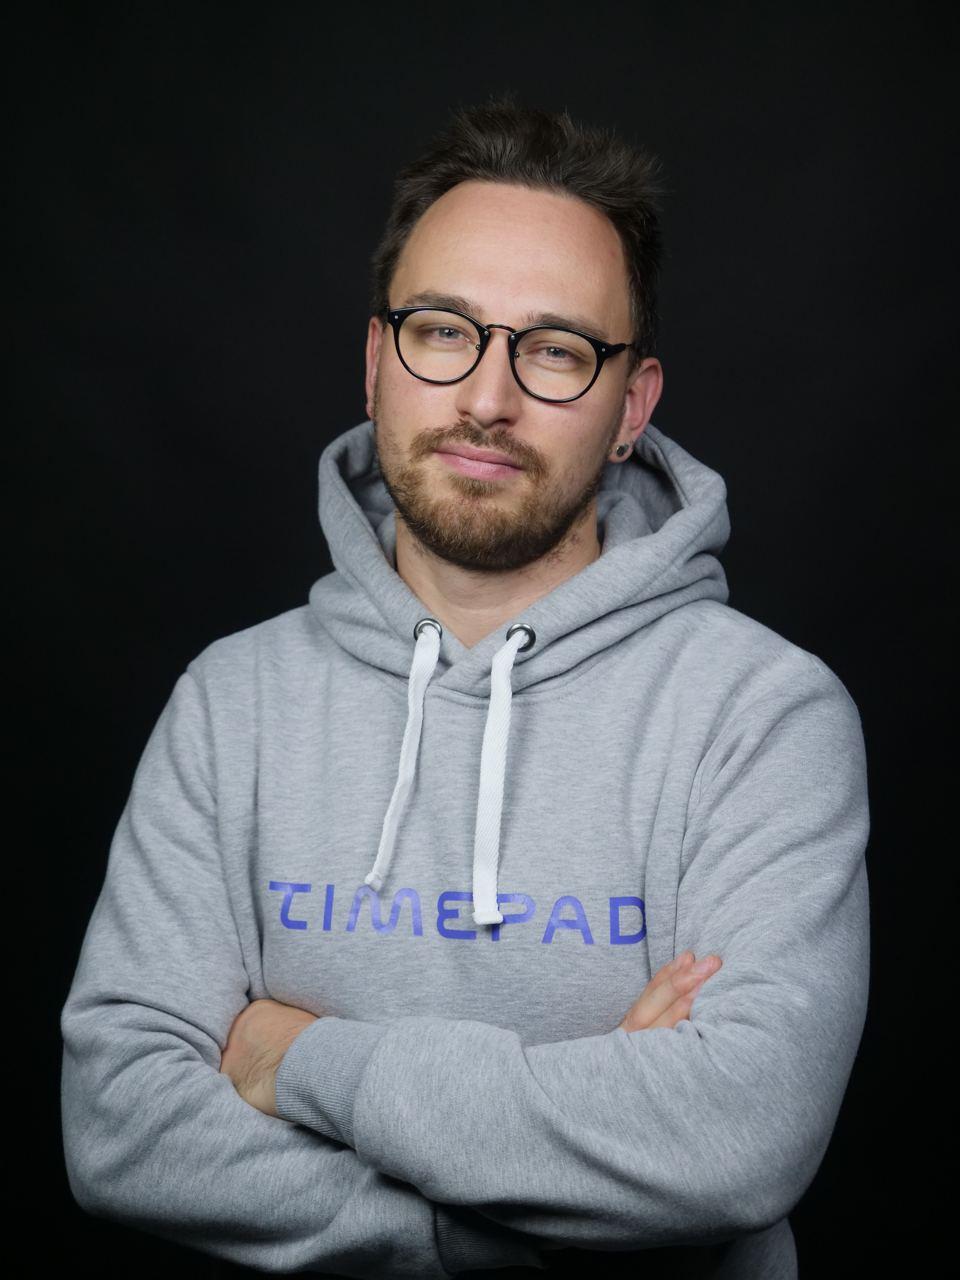 Директор по маркетингу Timepad: «Ключ ко всему – диалог»